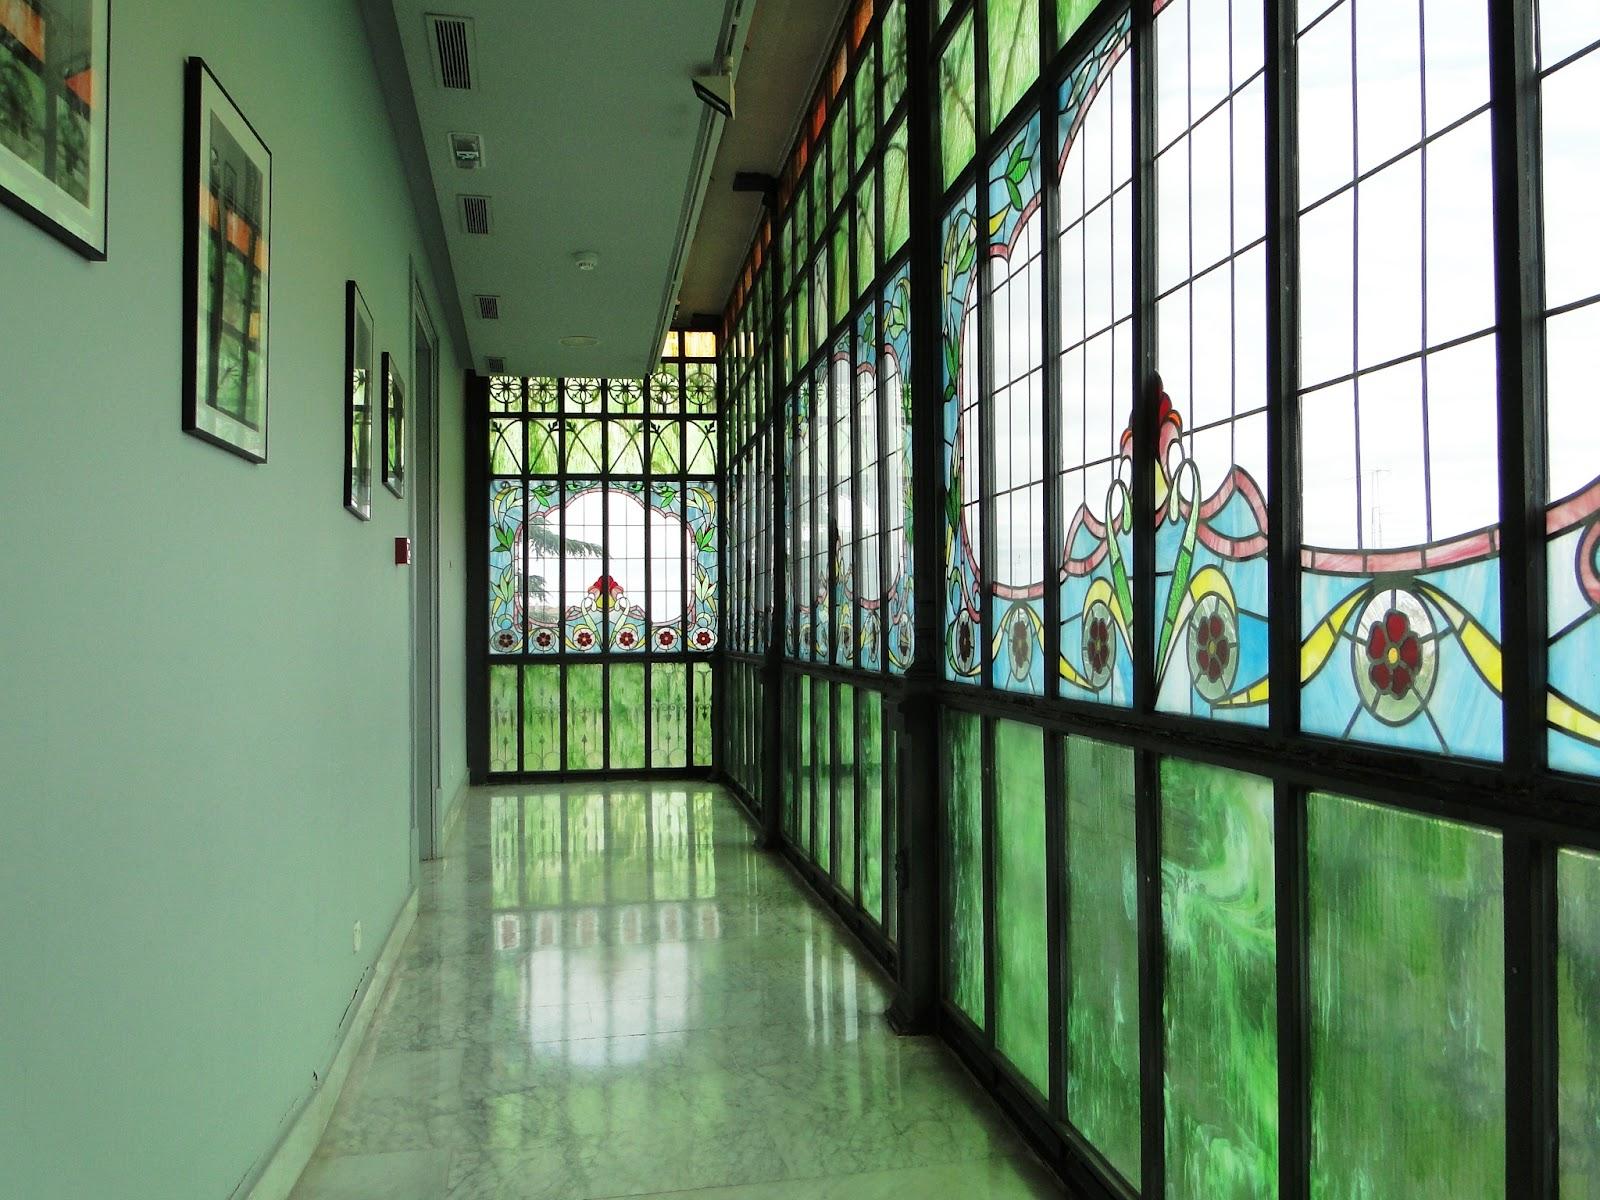 VIDA VIAJERA: Casa Lis (Salamanca) – Museo Art Nouveau y Art Déco